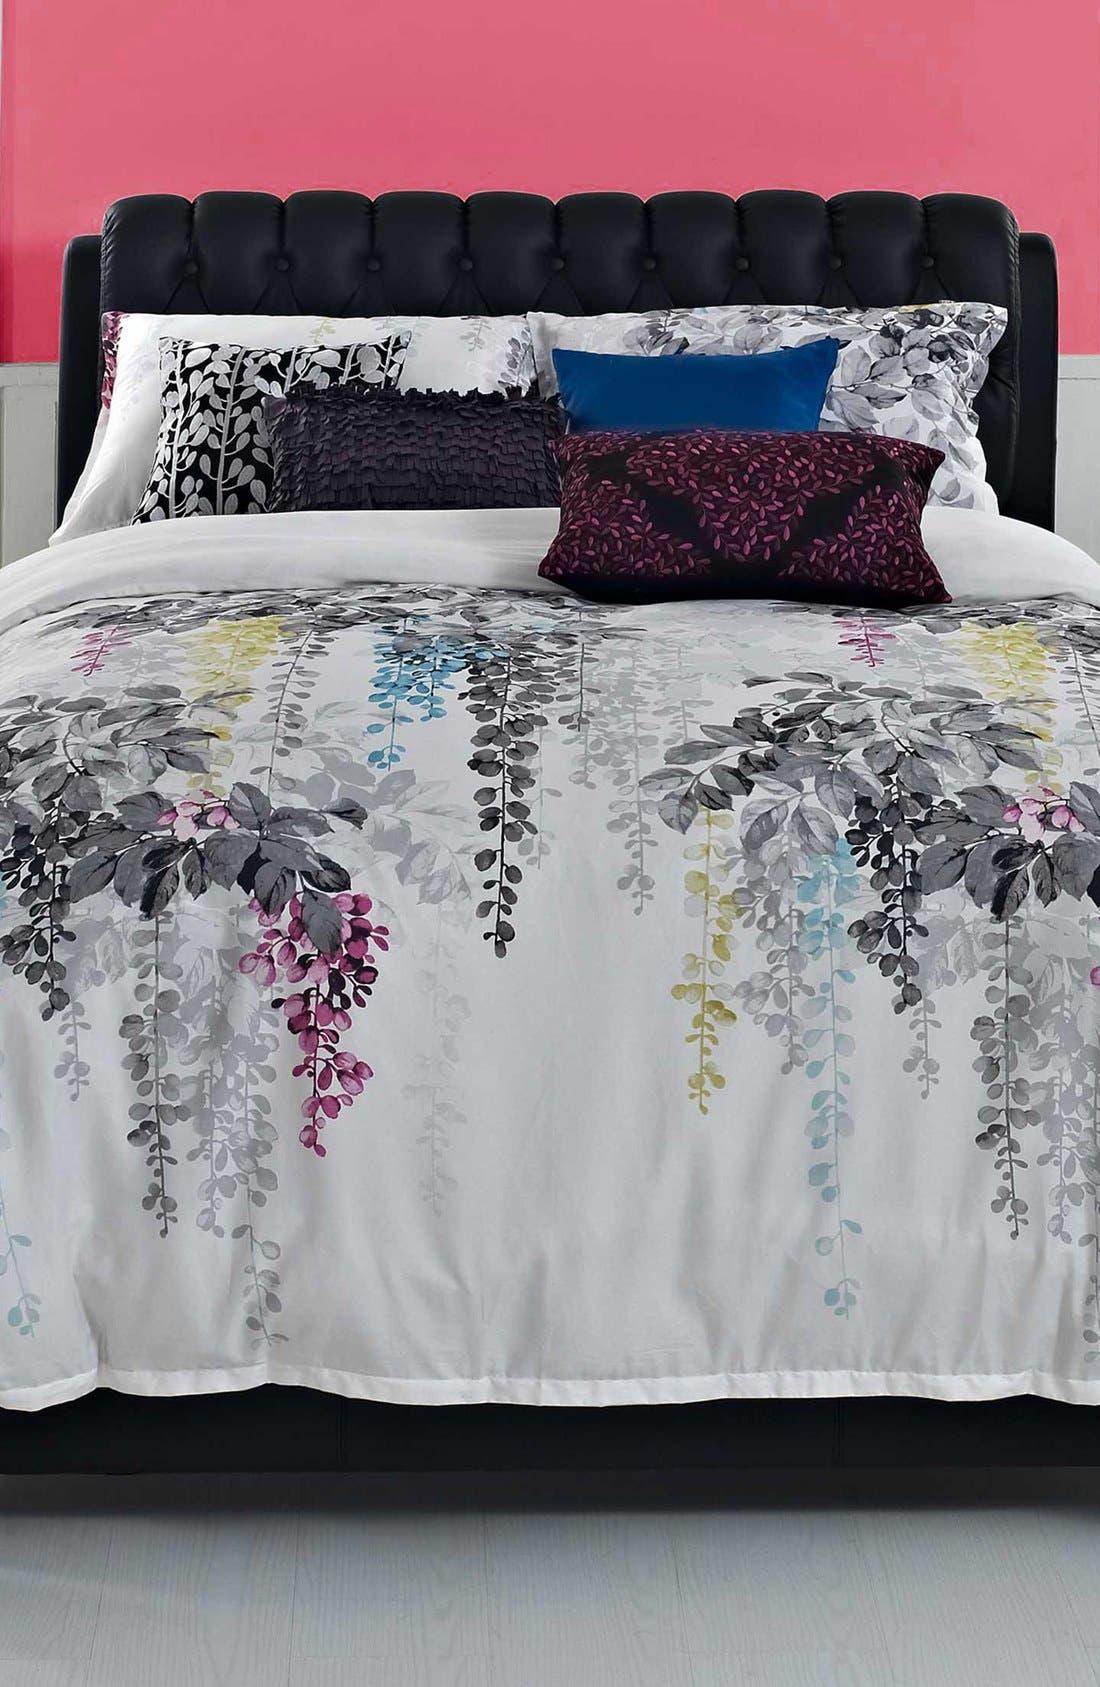 Alternate Image 1 Selected - KAS Designs 'Veranda' Duvet Cover